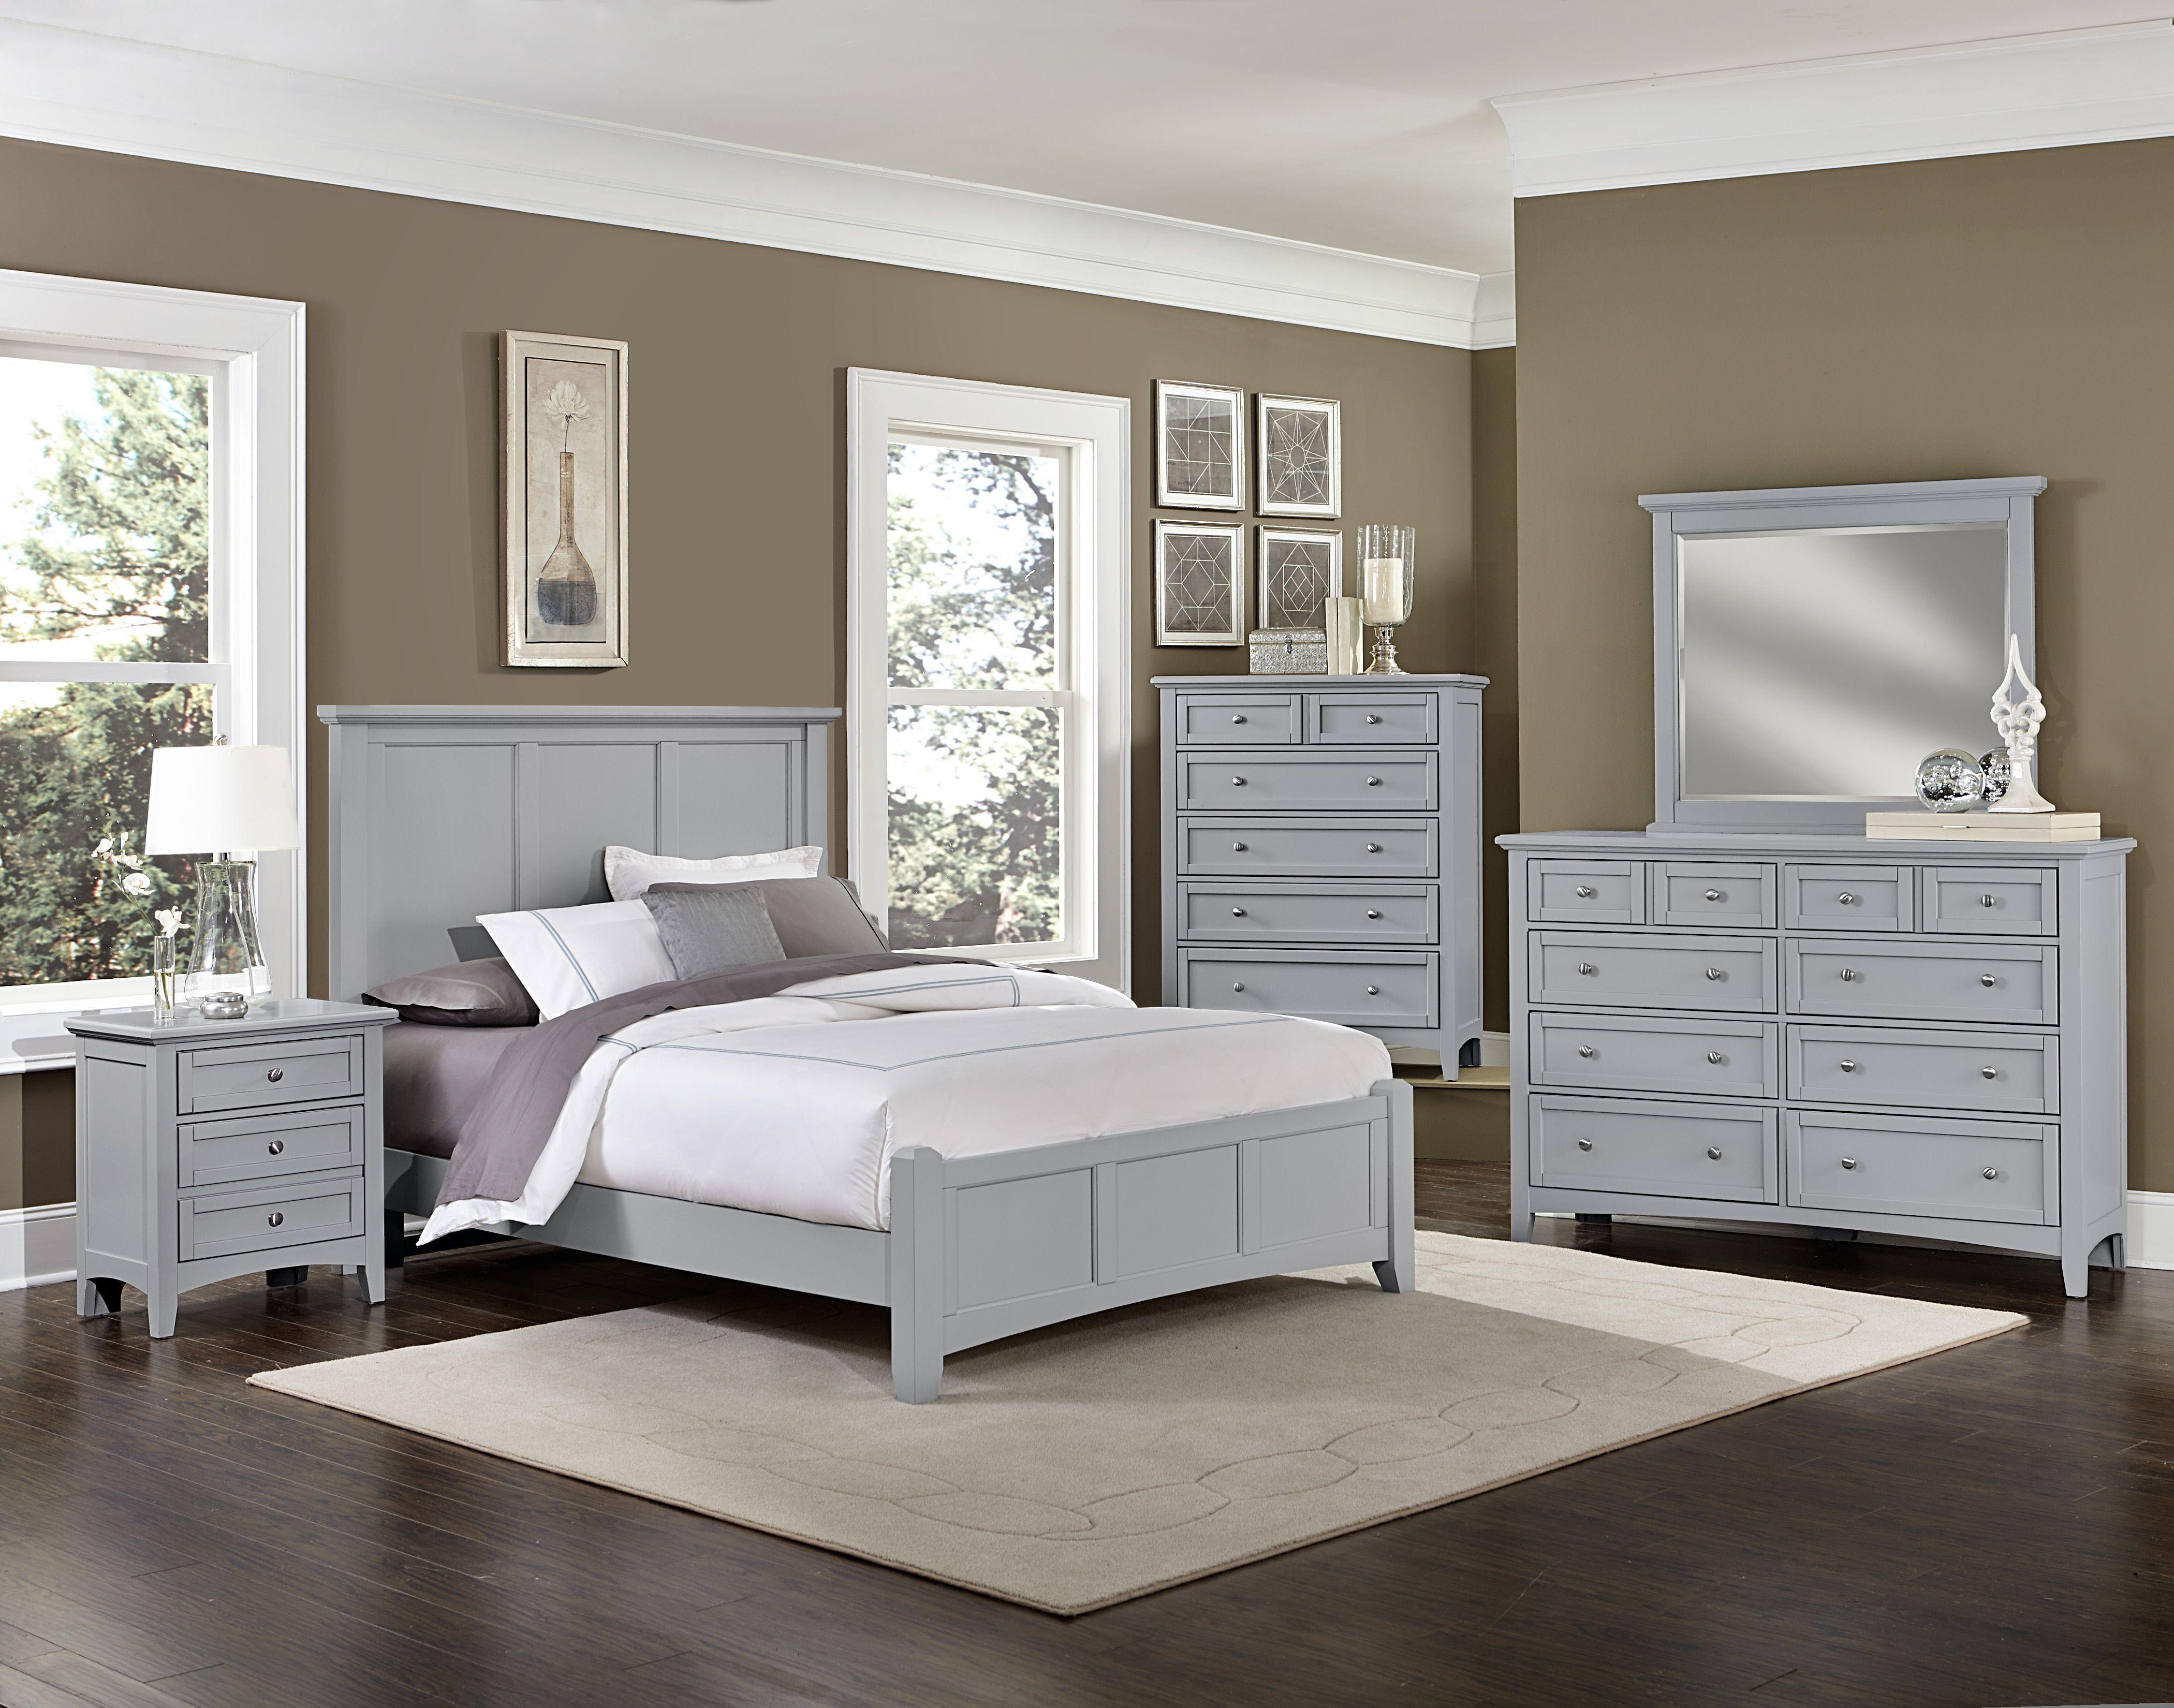 used vaughan bassett bedroom furniture vaughan bassett bedroom